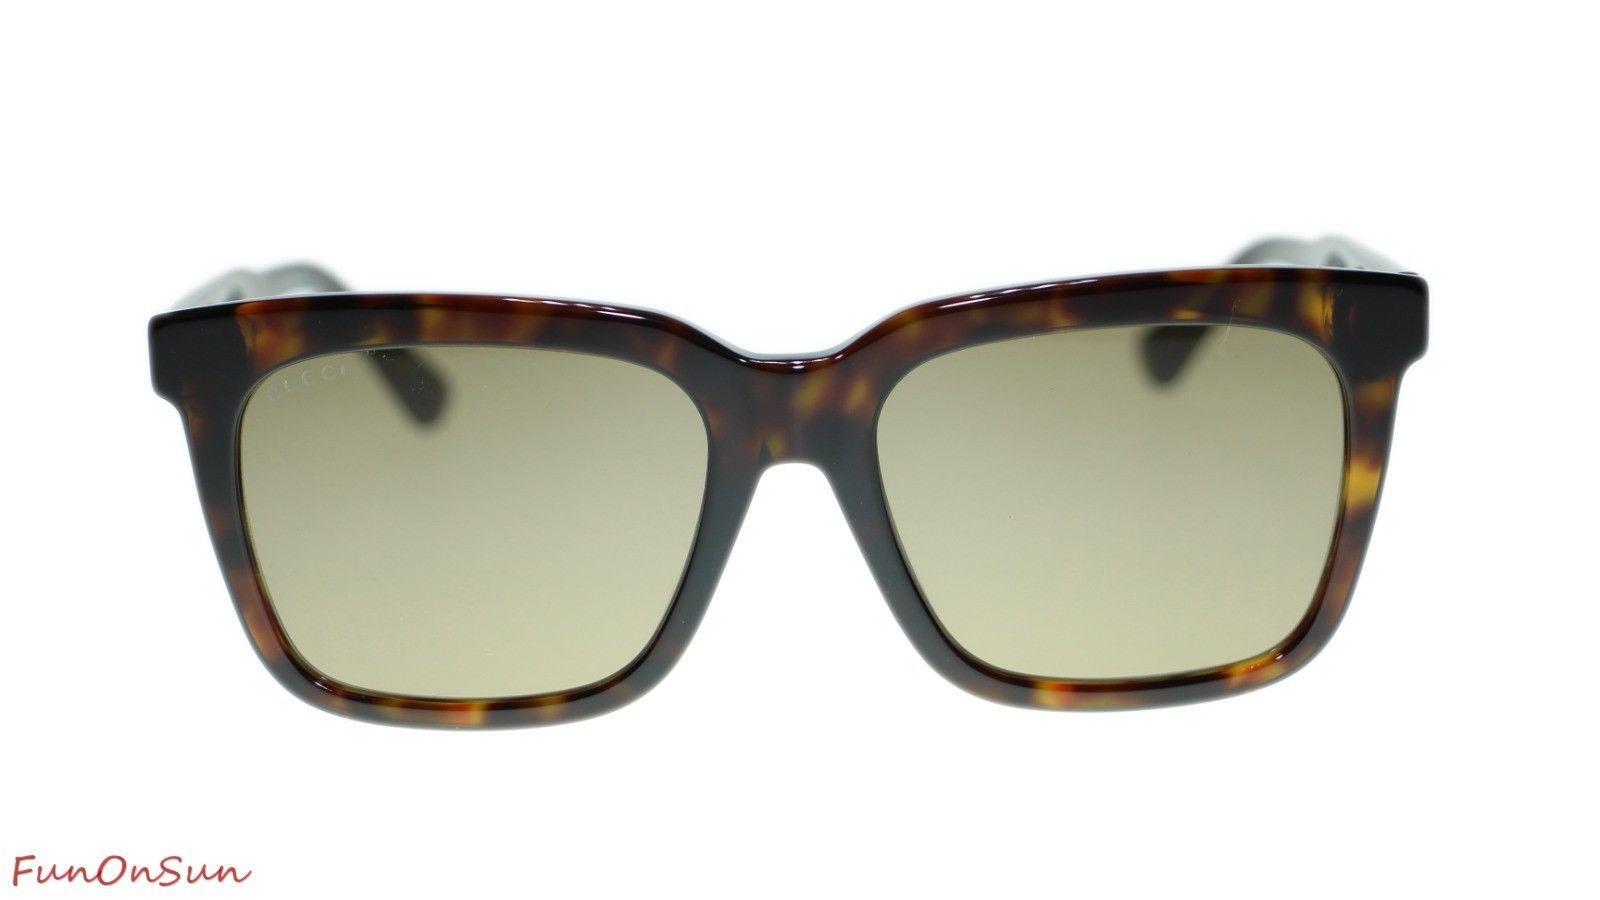 2af4fbc0ce NEW Gucci Men s Sunglasses GG0267SA 002 Havana Brown Lens Square 55mm  Authentic